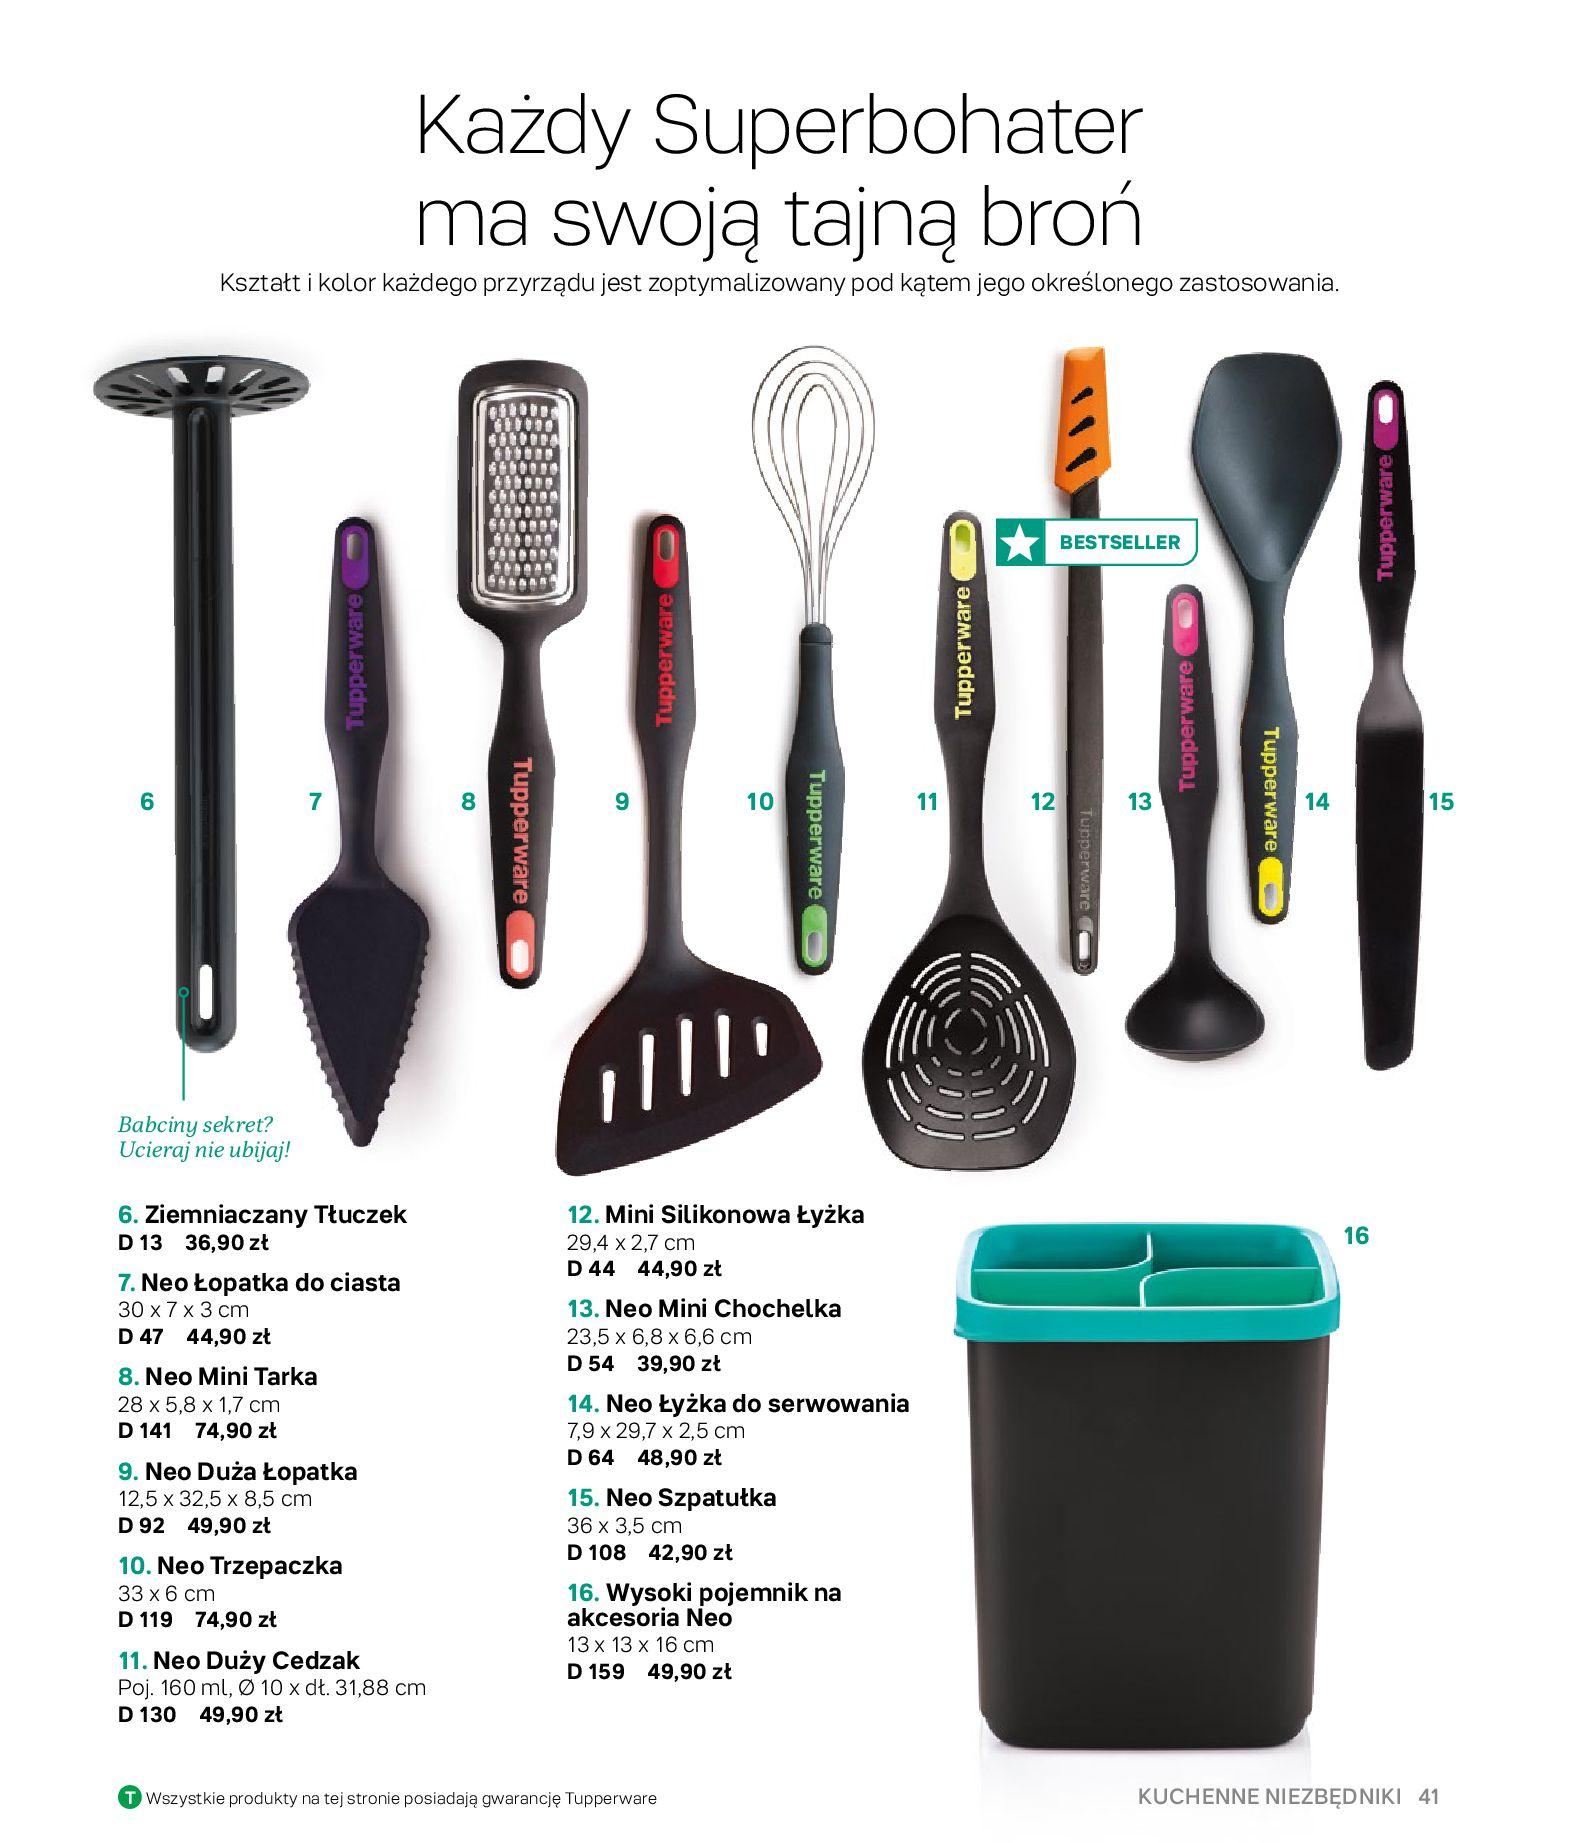 Gazetka Tupperware: Gazetka Tupperware - Katalog wiosna/ lato 2021-05-10 page-41